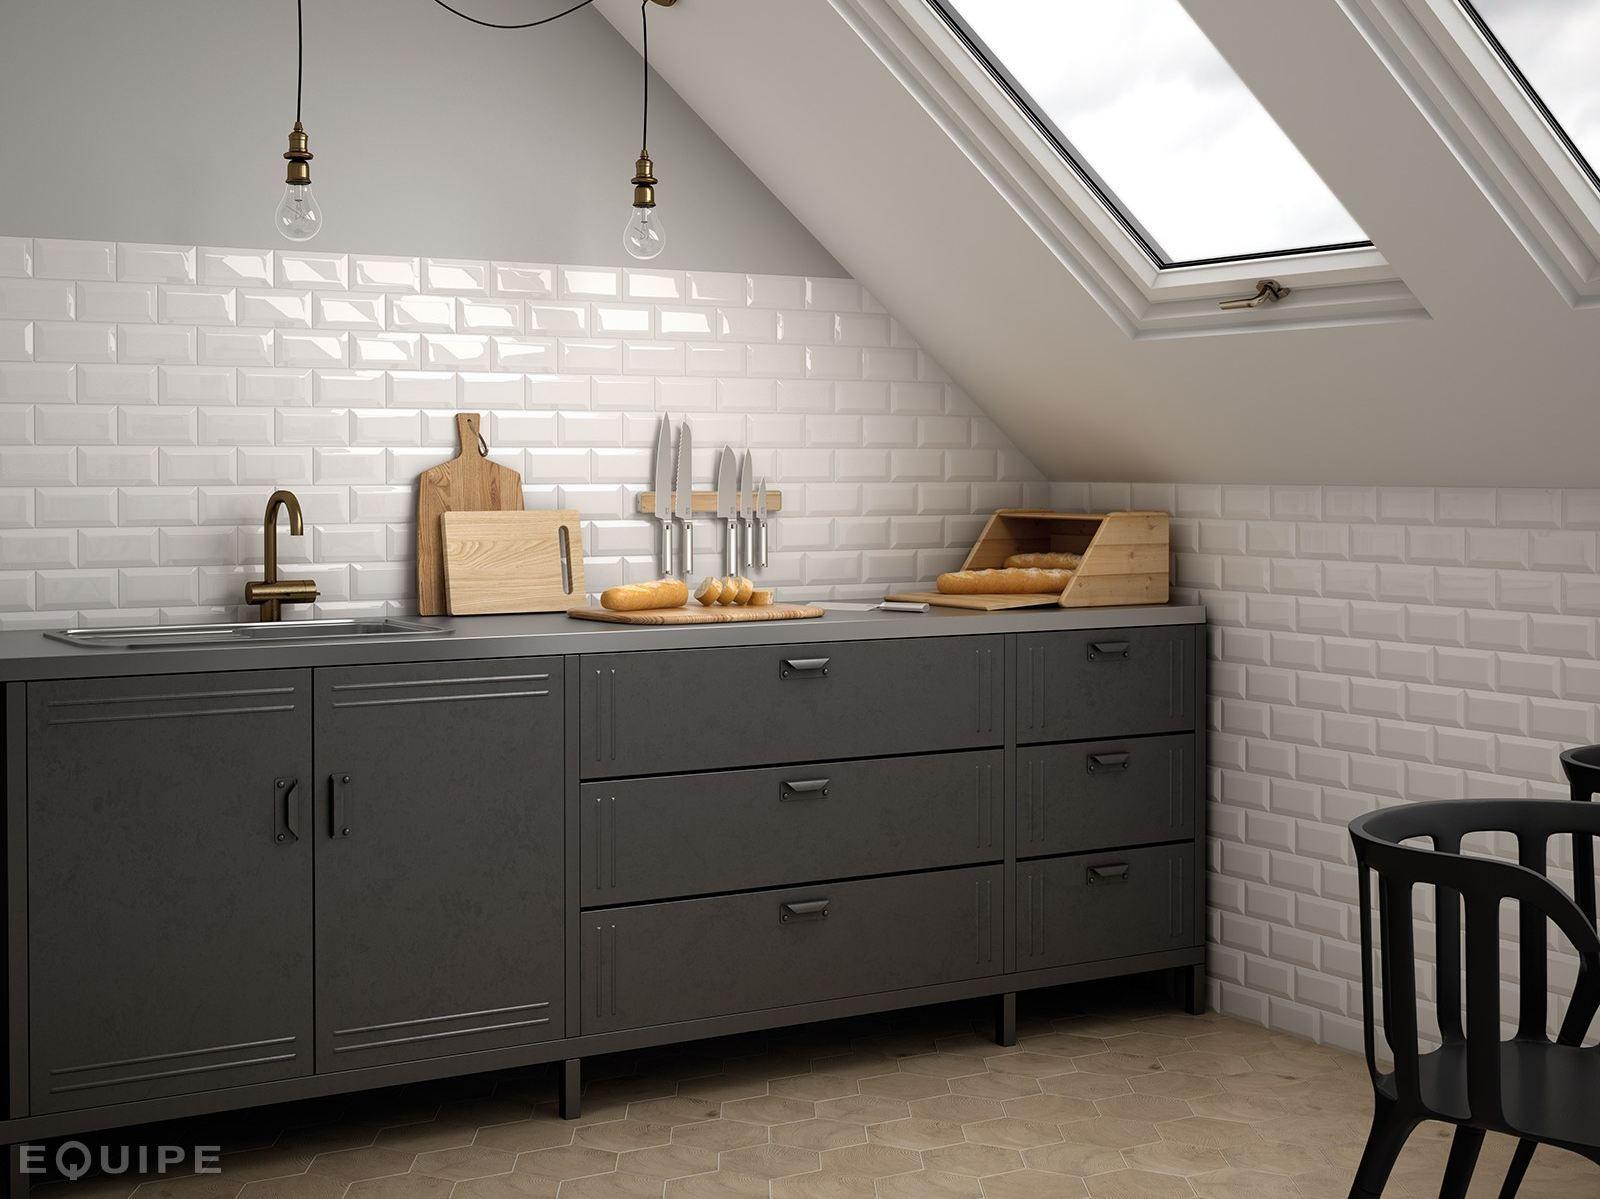 White Paste Wall Tiles Metro By Equipe Ceramicas Kitchen Wall Tiles Kitchen Wall Metro Tiles